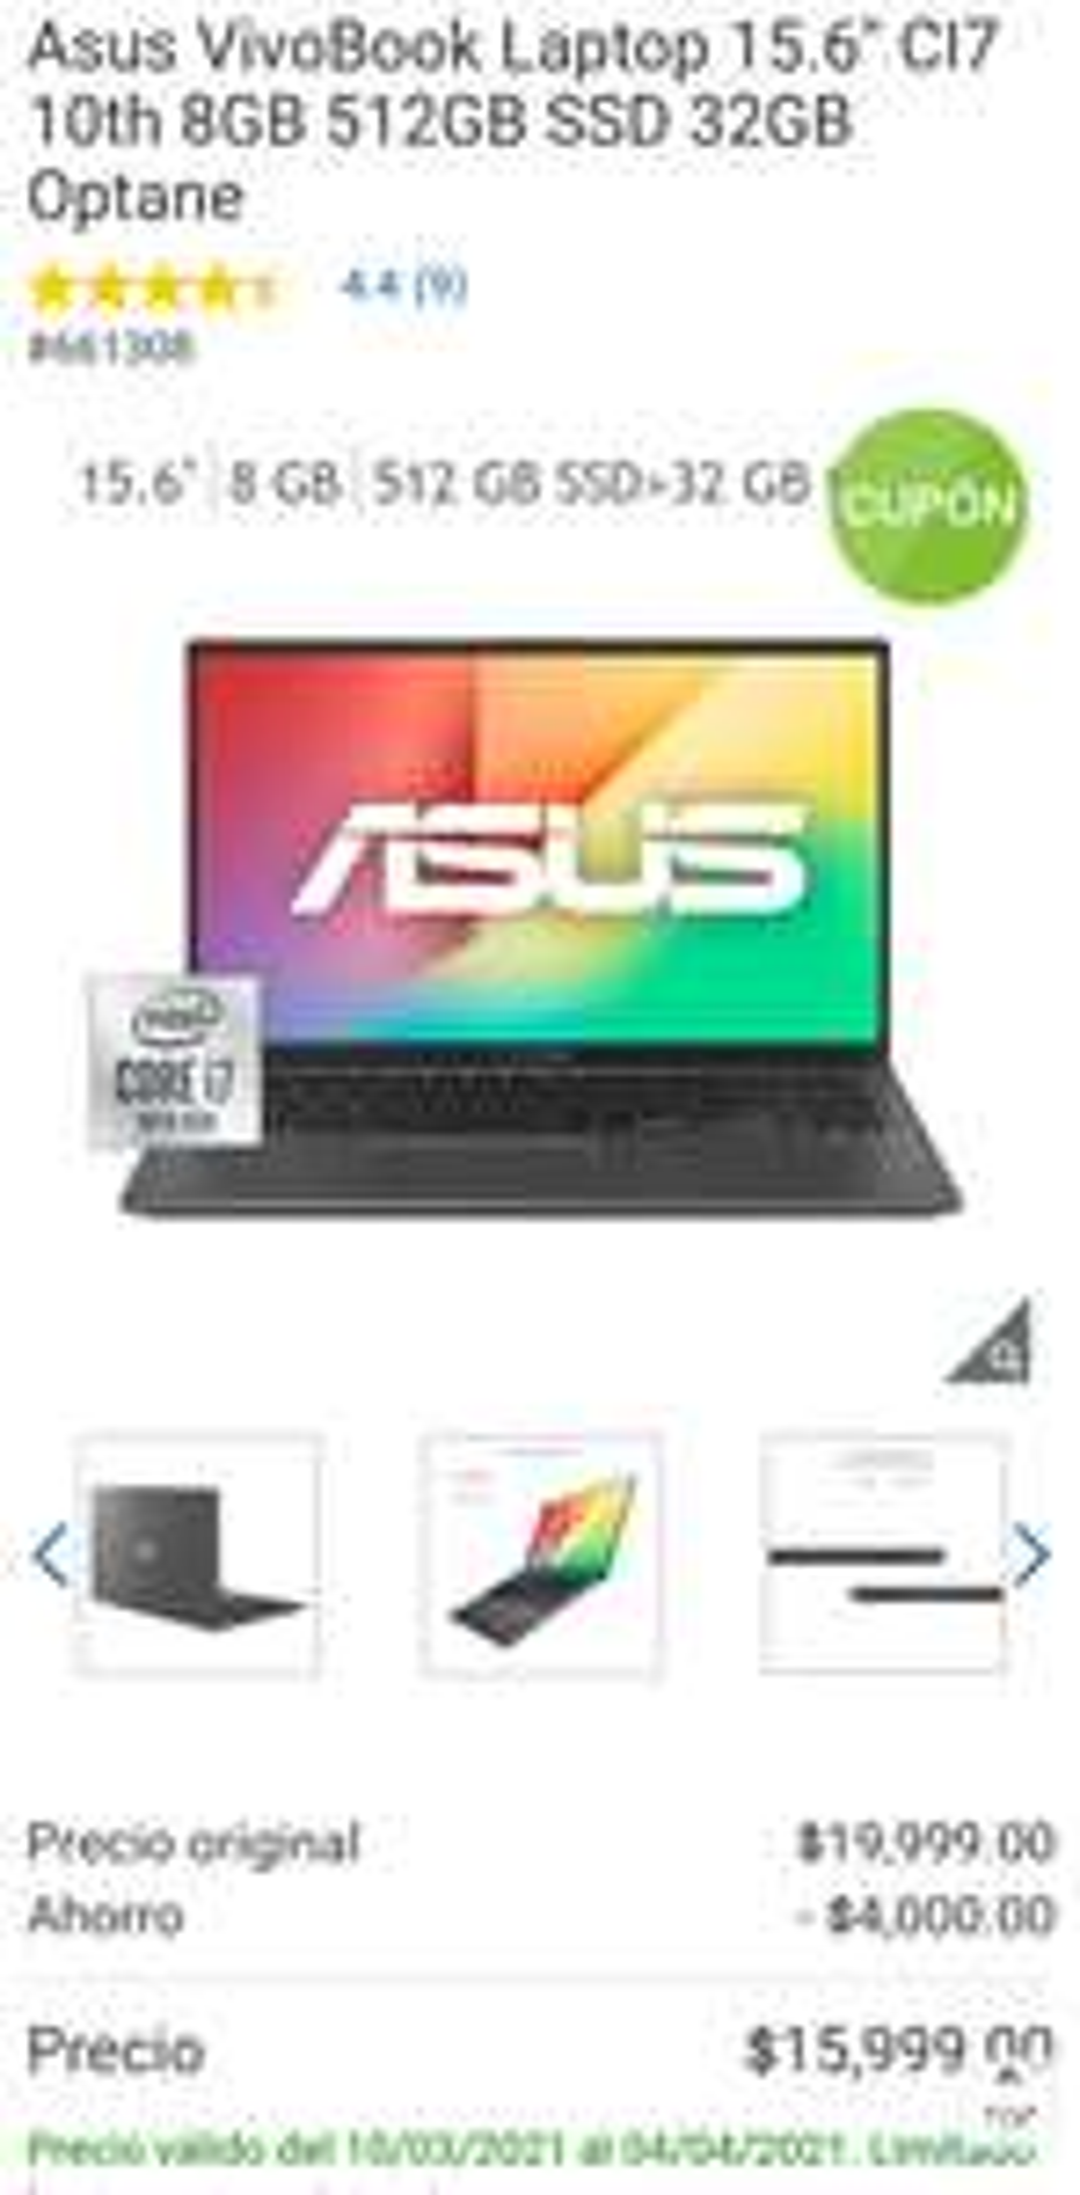 "Costco: Asus VivoBook Laptop 15.6"" CI7 10th 8GB 512GB SSD 32GB Optane"